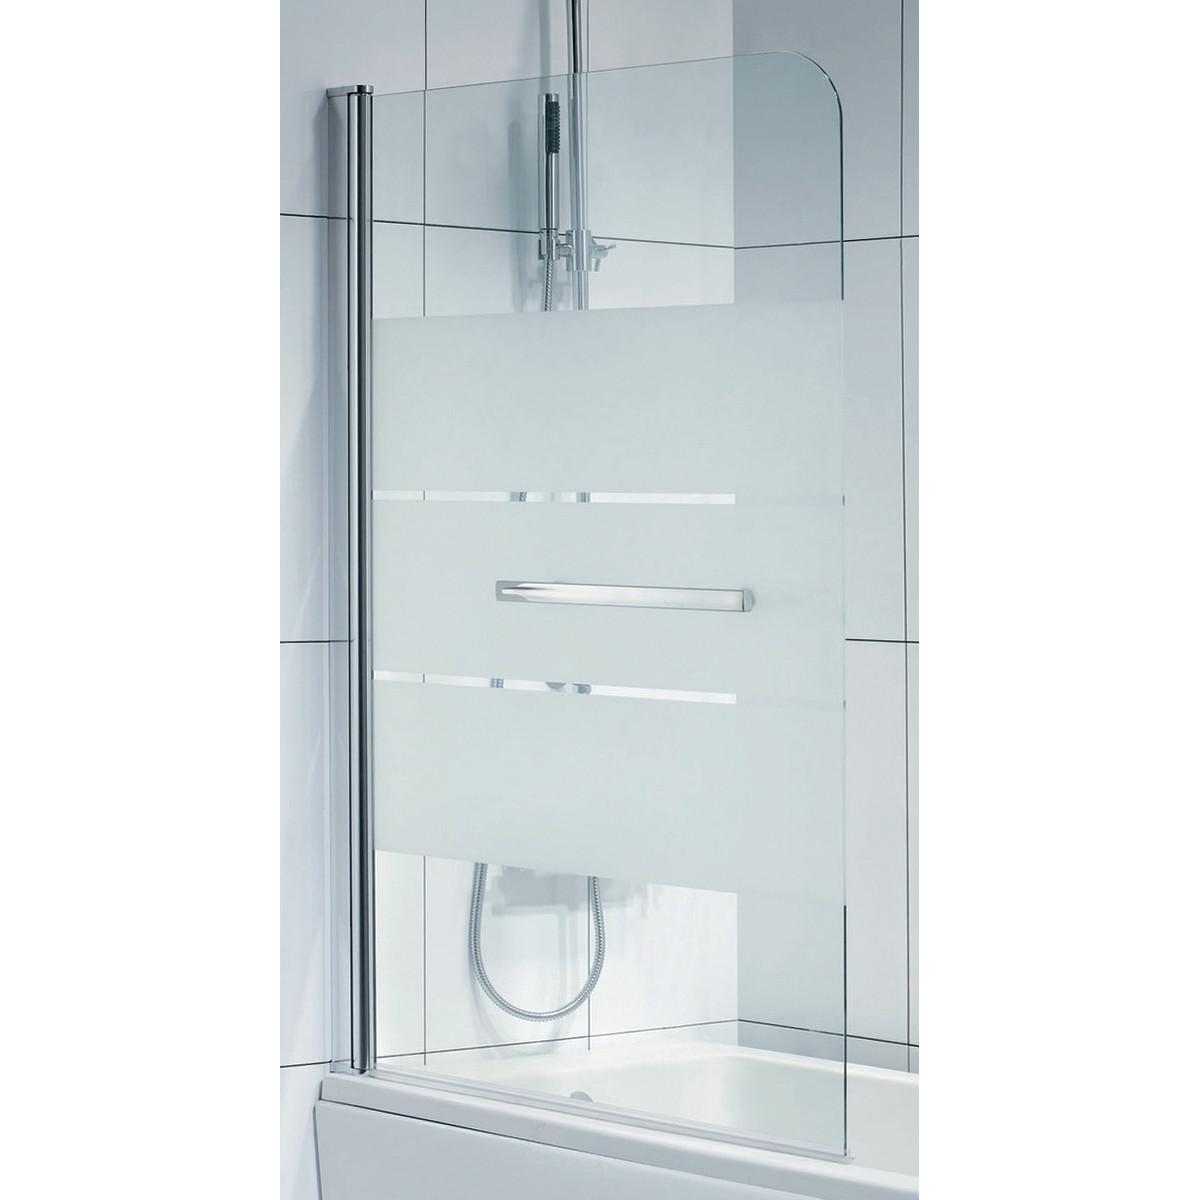 Parete in vetro per vasca da bagno - Cabine doccia prezzi leroy merlin ...